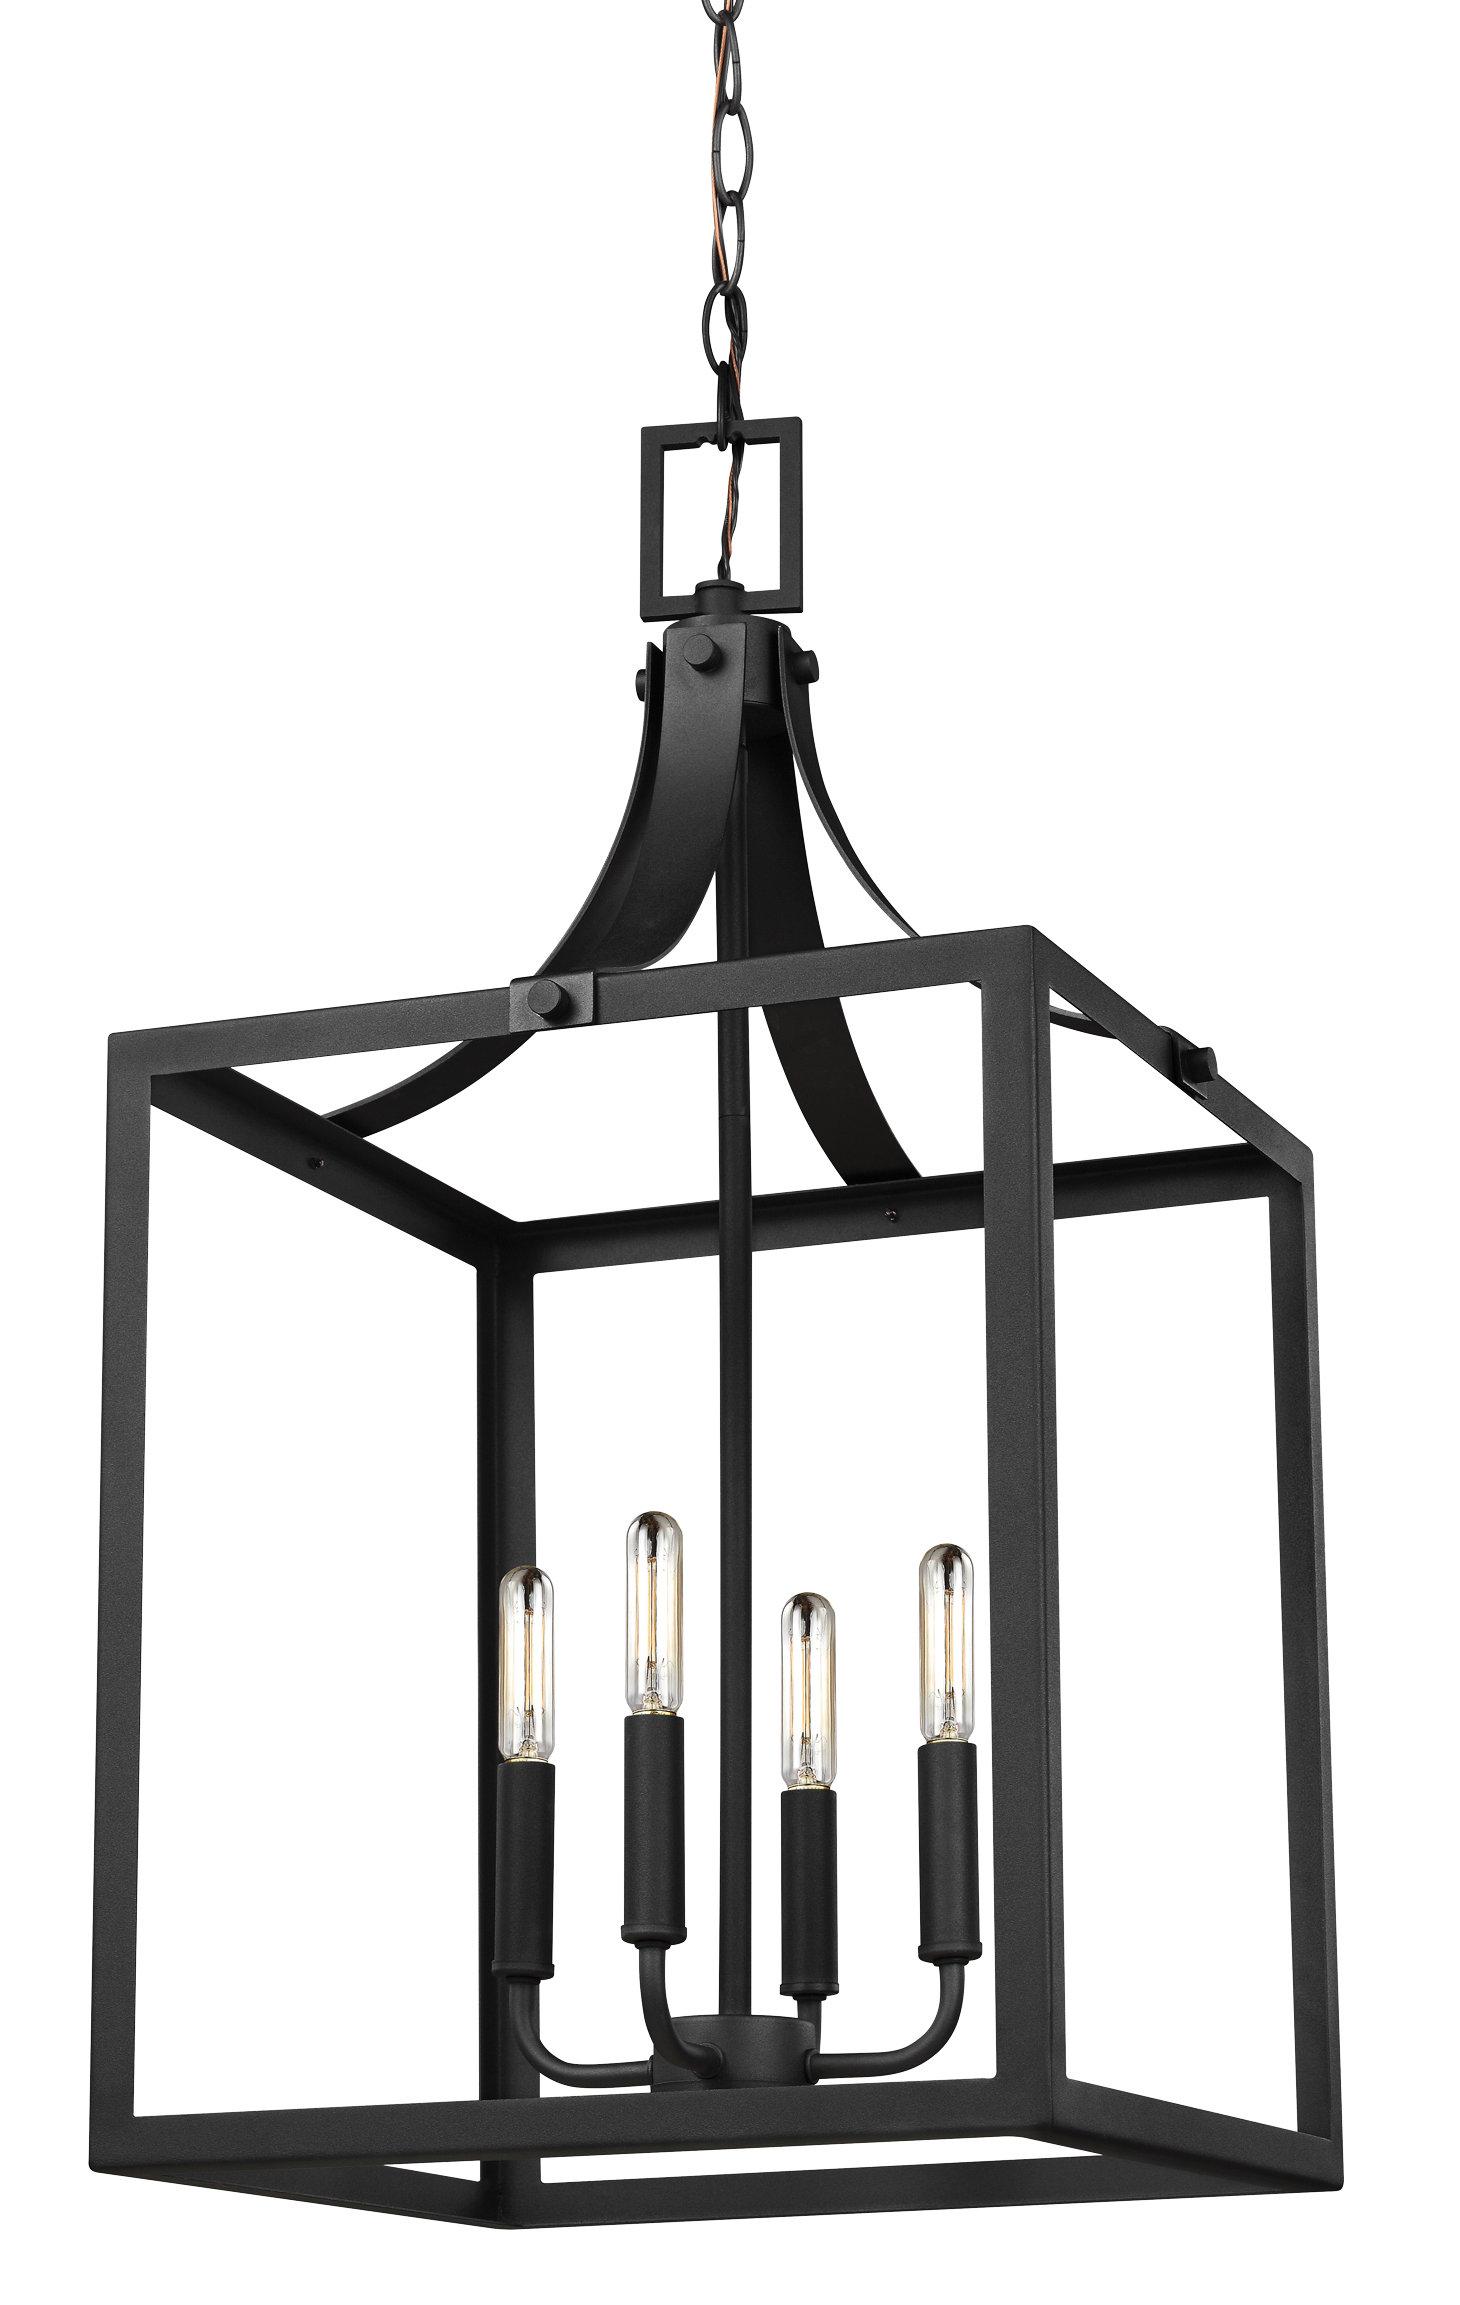 Gracie Oaks Sherri-Ann 4-Light Lantern Square / Rectangle Pendant with regard to Odie 8-Light Lantern Square / Rectangle Pendants (Image 11 of 30)